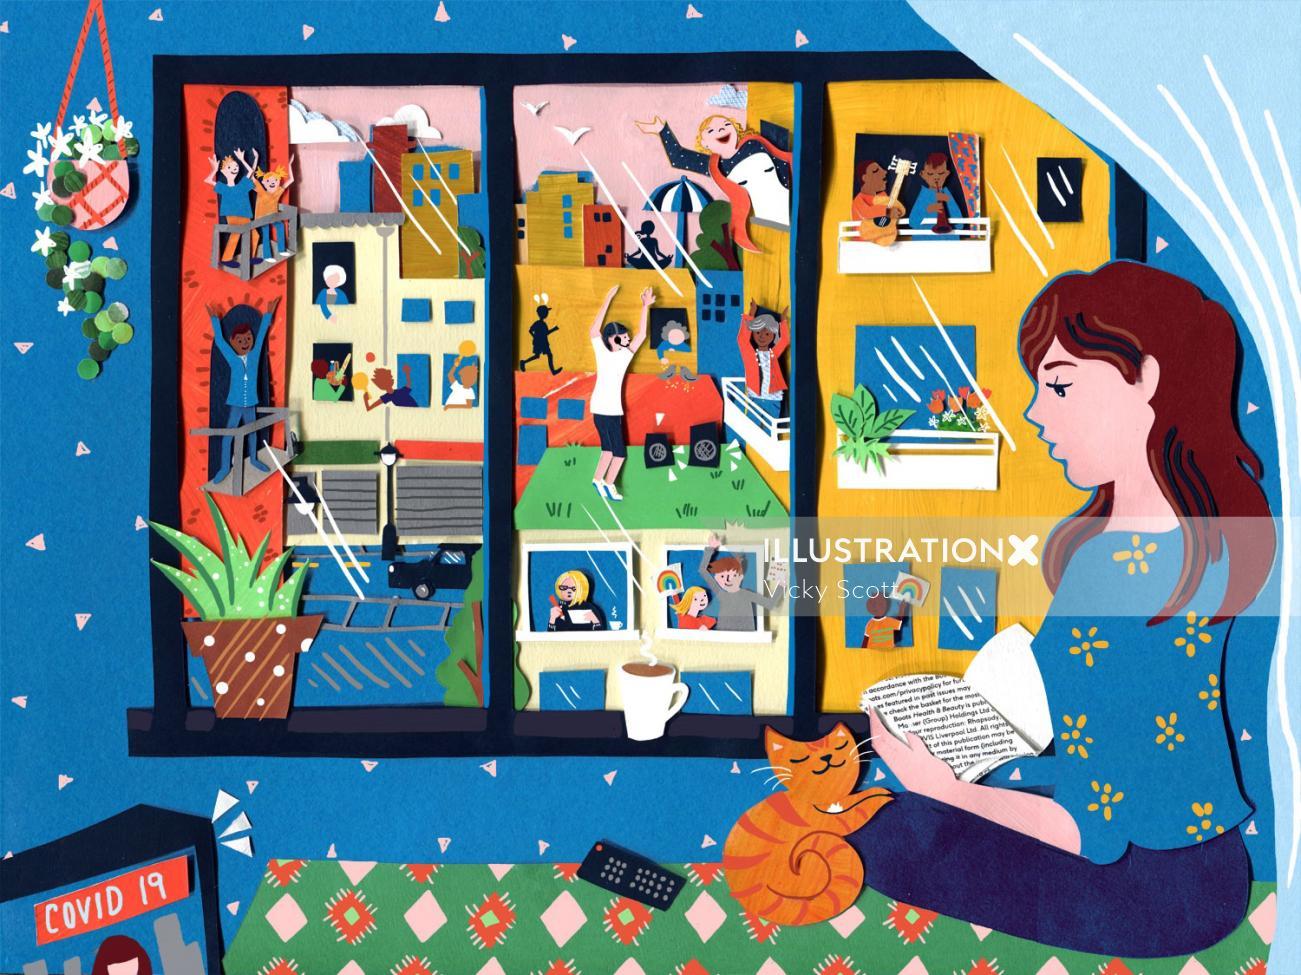 social distancing, covid 19, coronovirus, interior, cat, home, excercise, cityscape, streetscene, mu